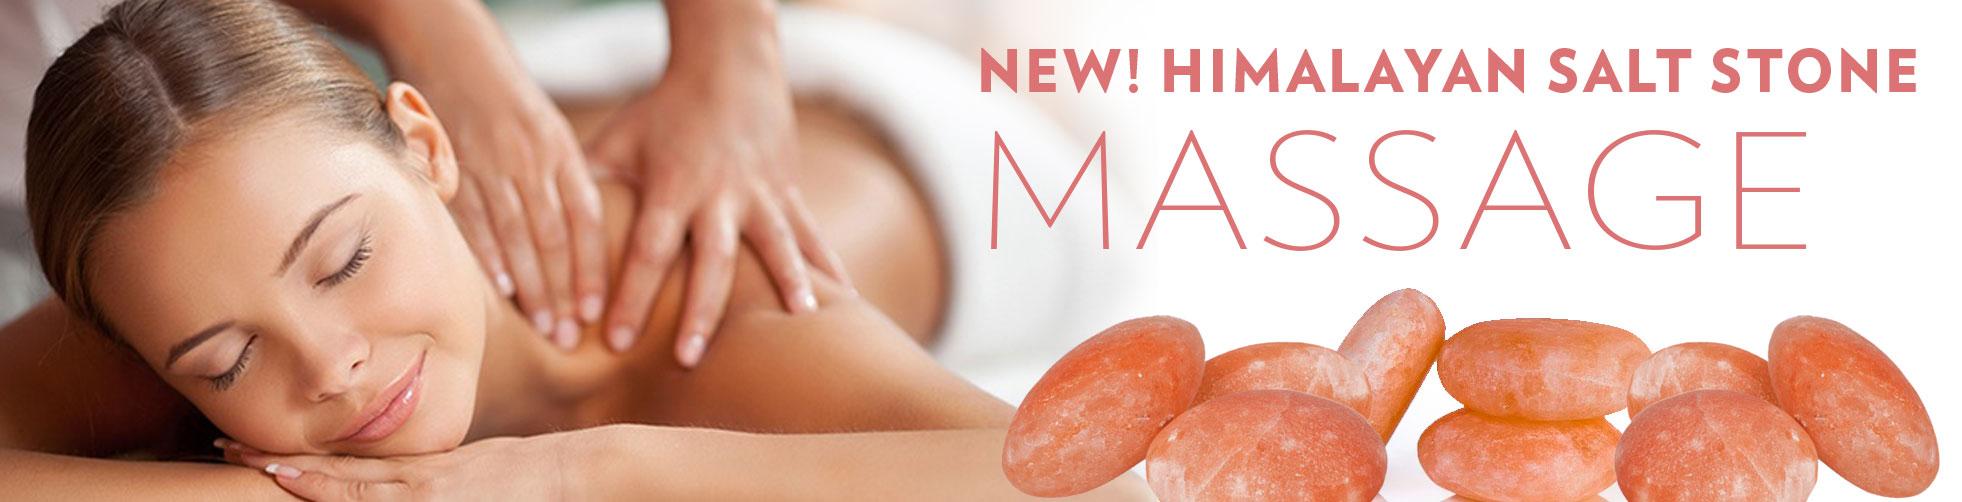 salt stone massage santa clarita